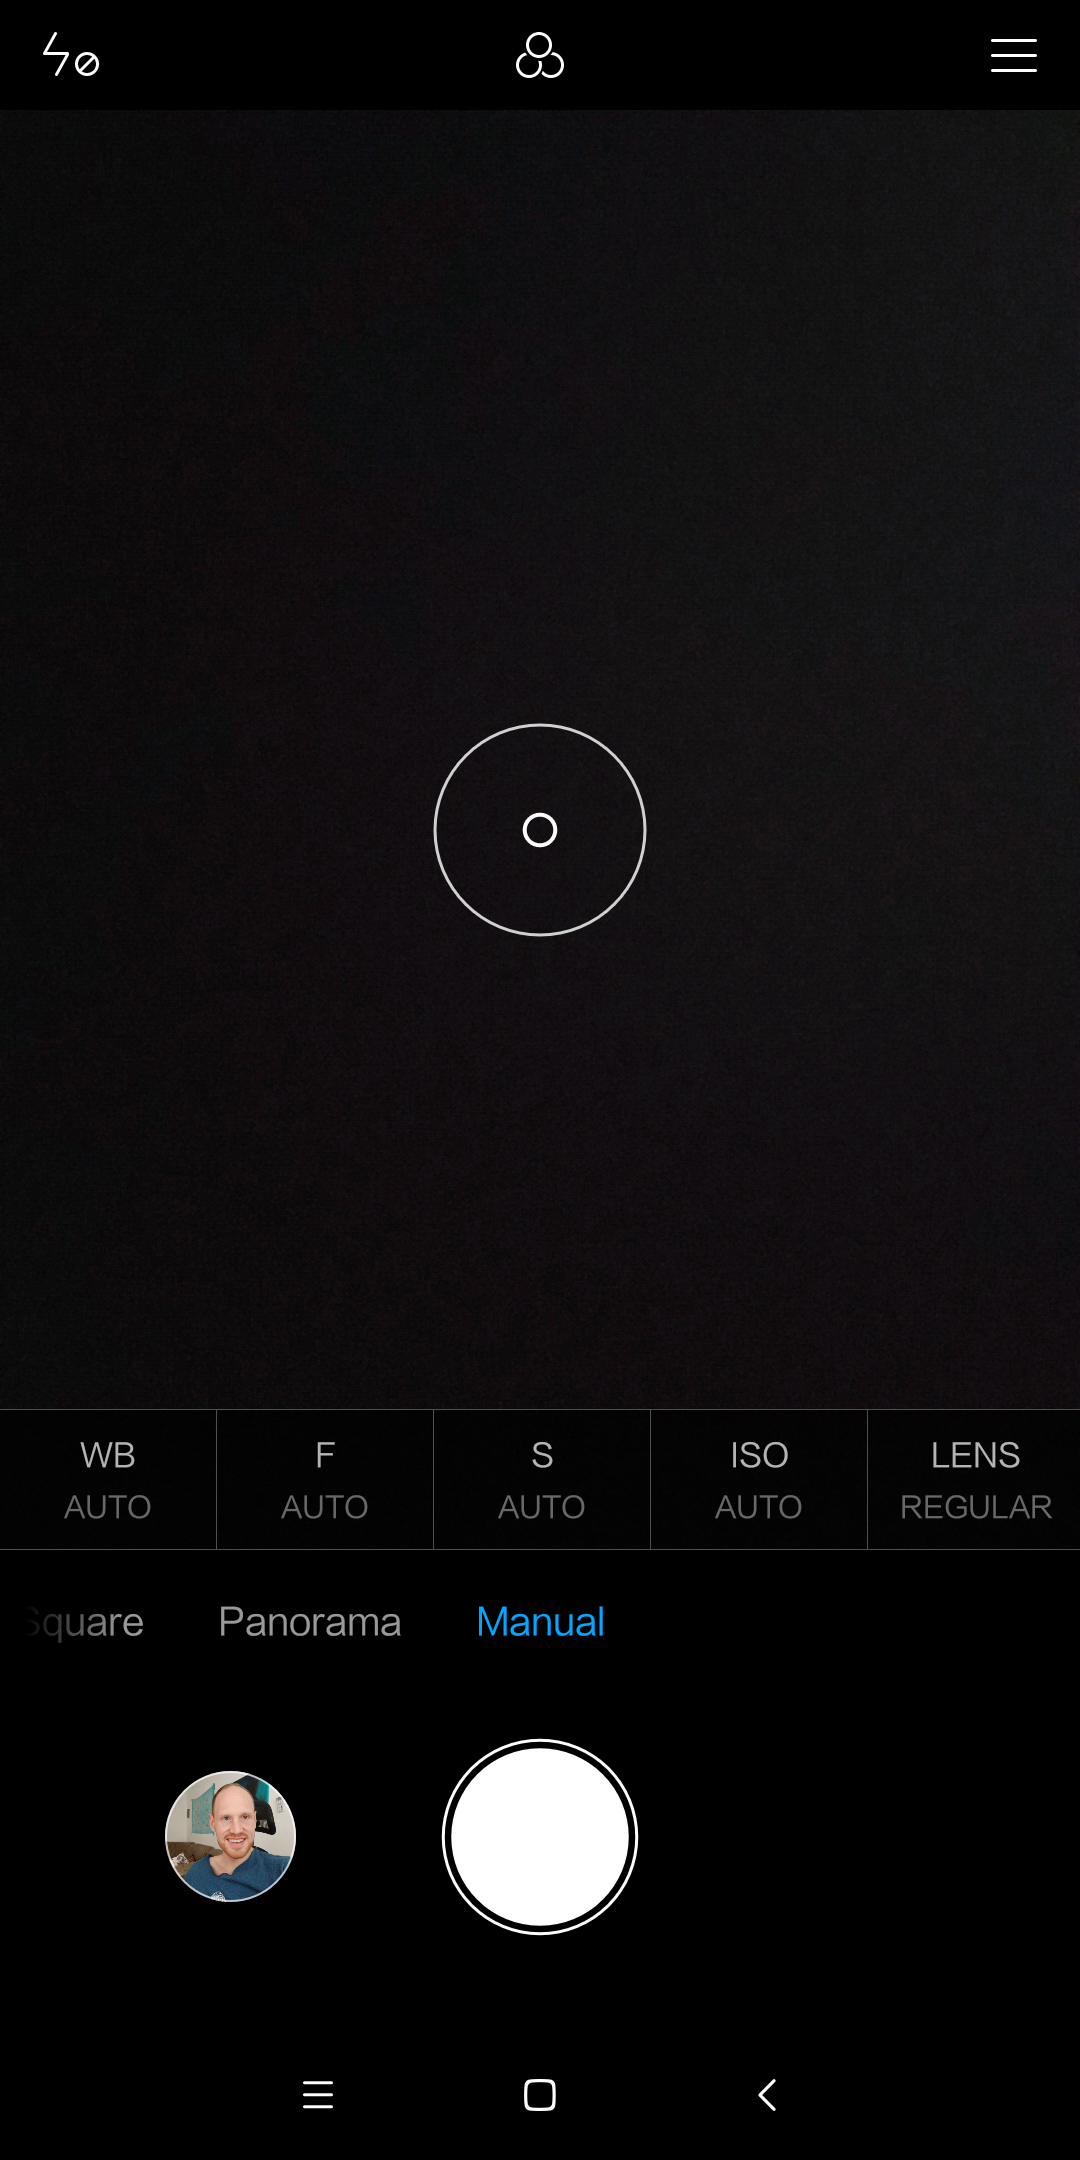 Xiaomi Mi 6X Camera App 2